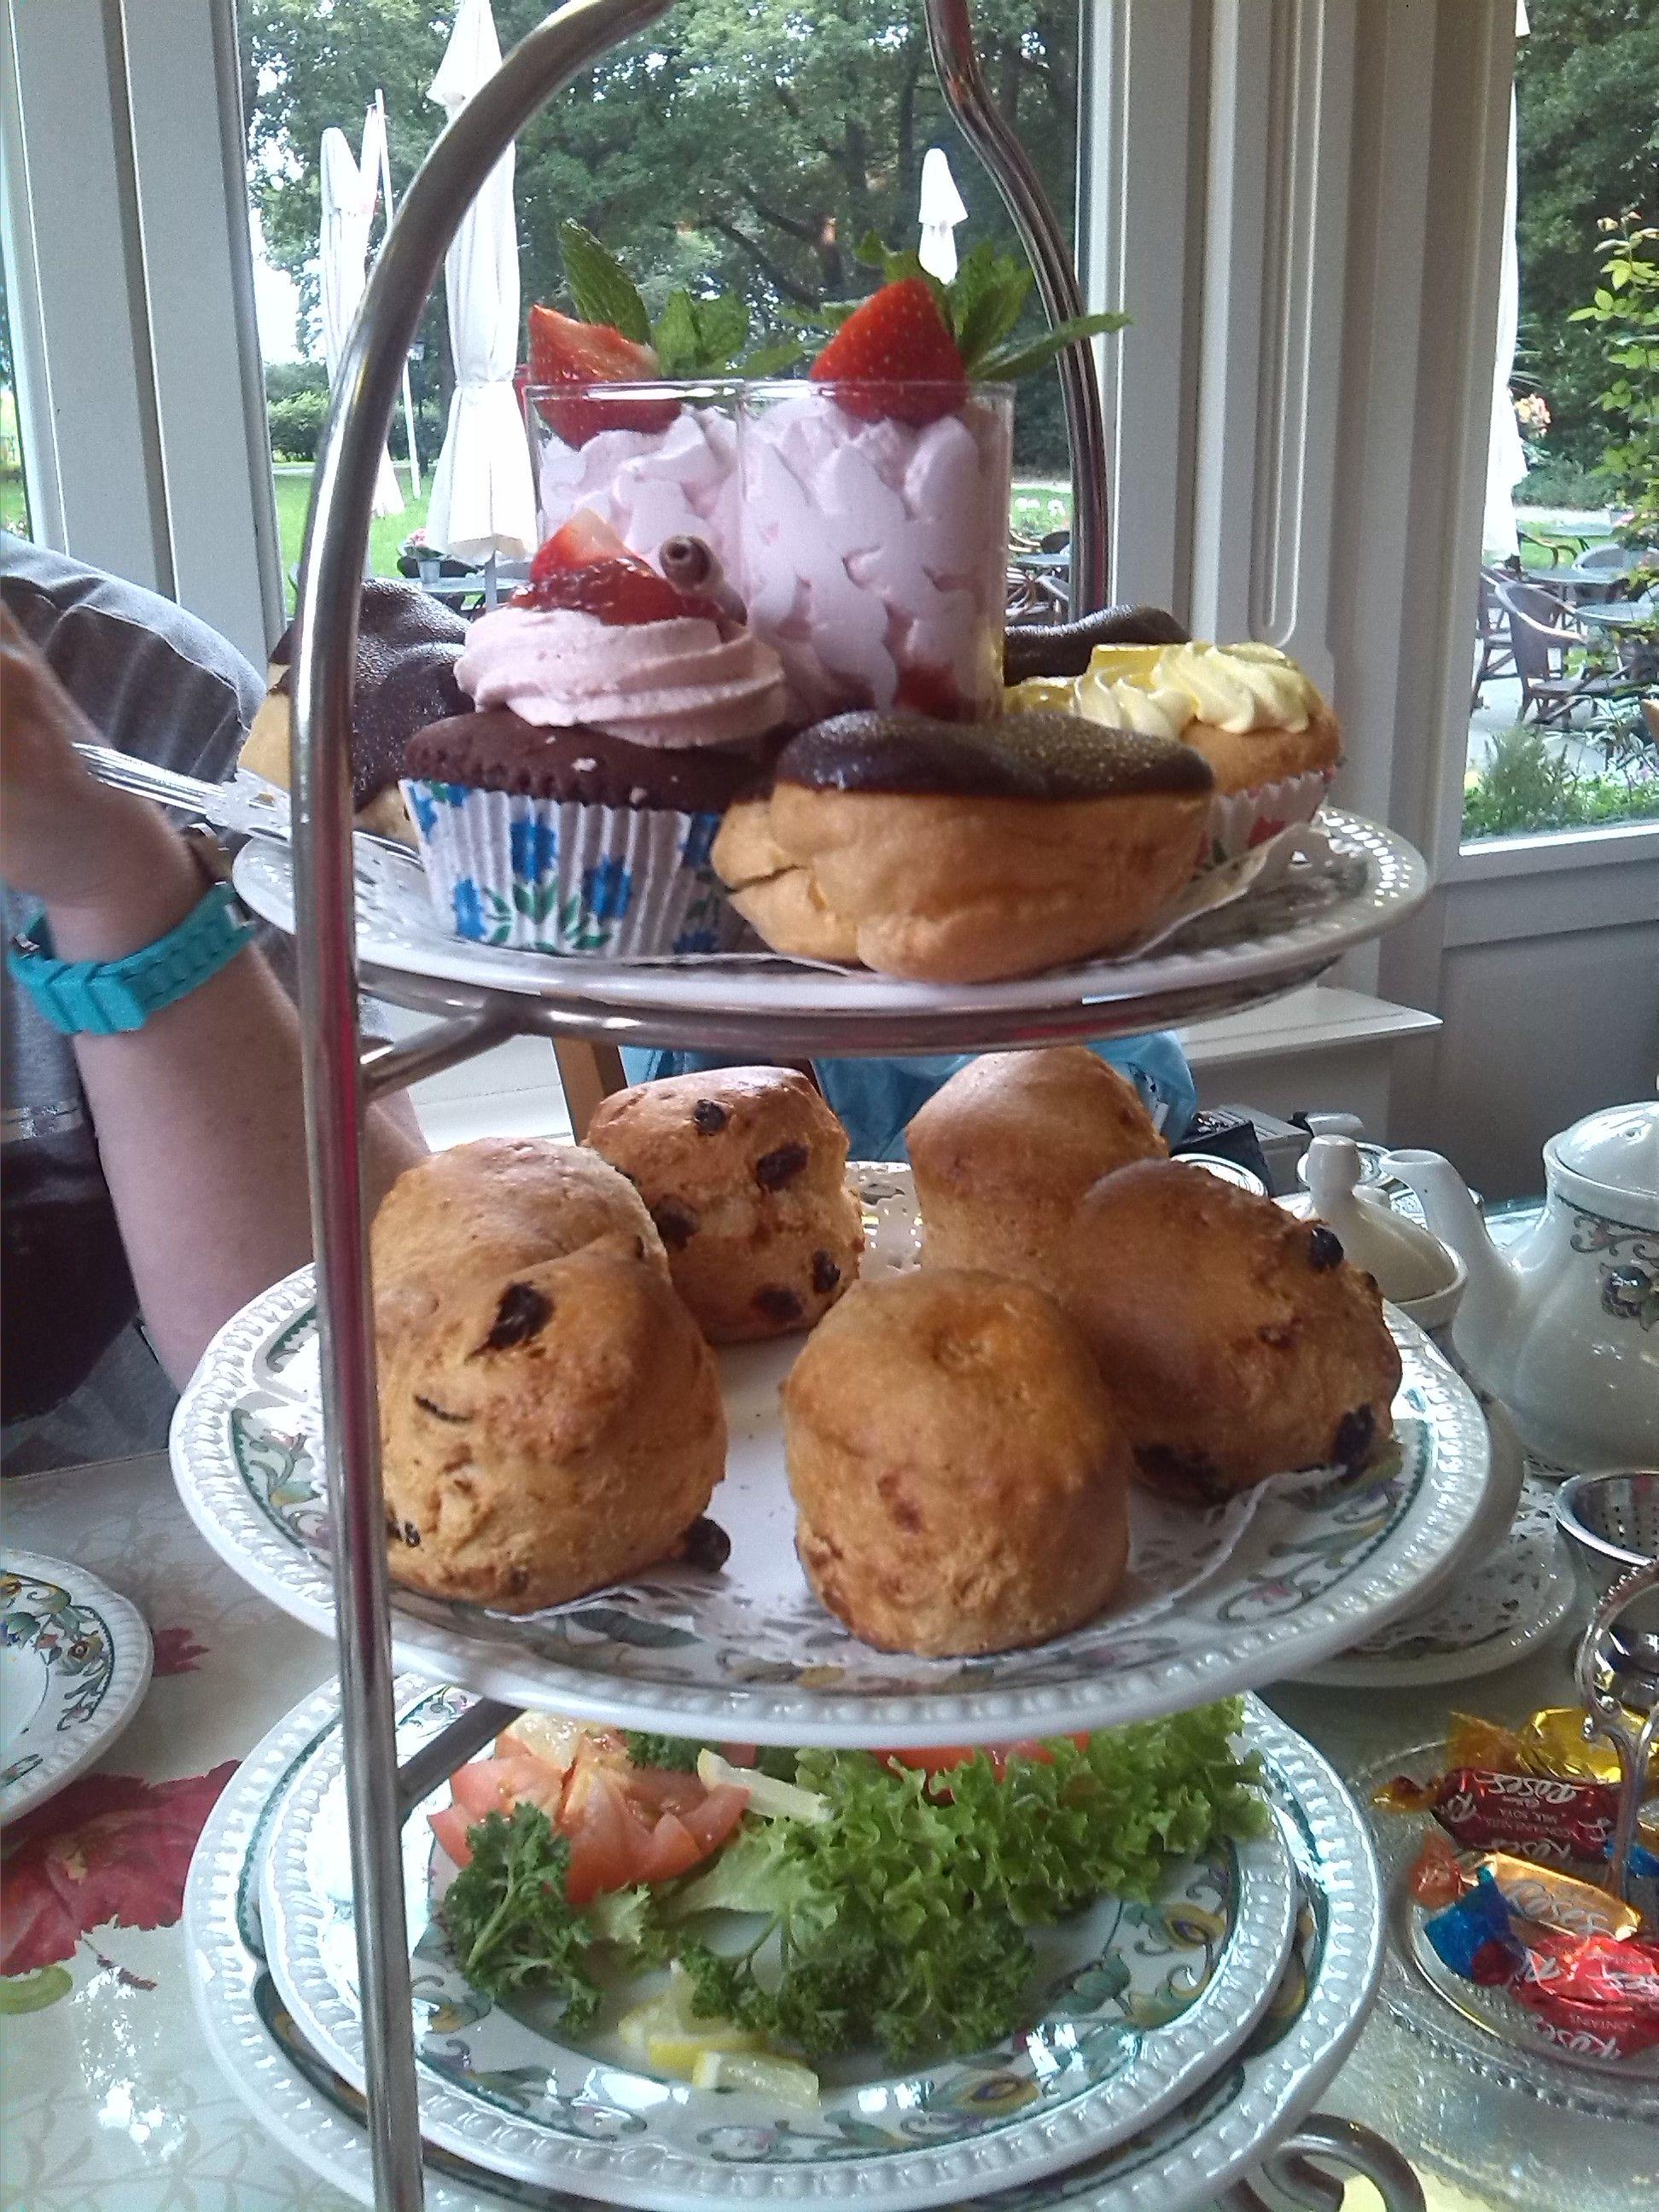 High tea at Tea Time Echten. The sandwiches at the bottom plate are eaten already....oeps.